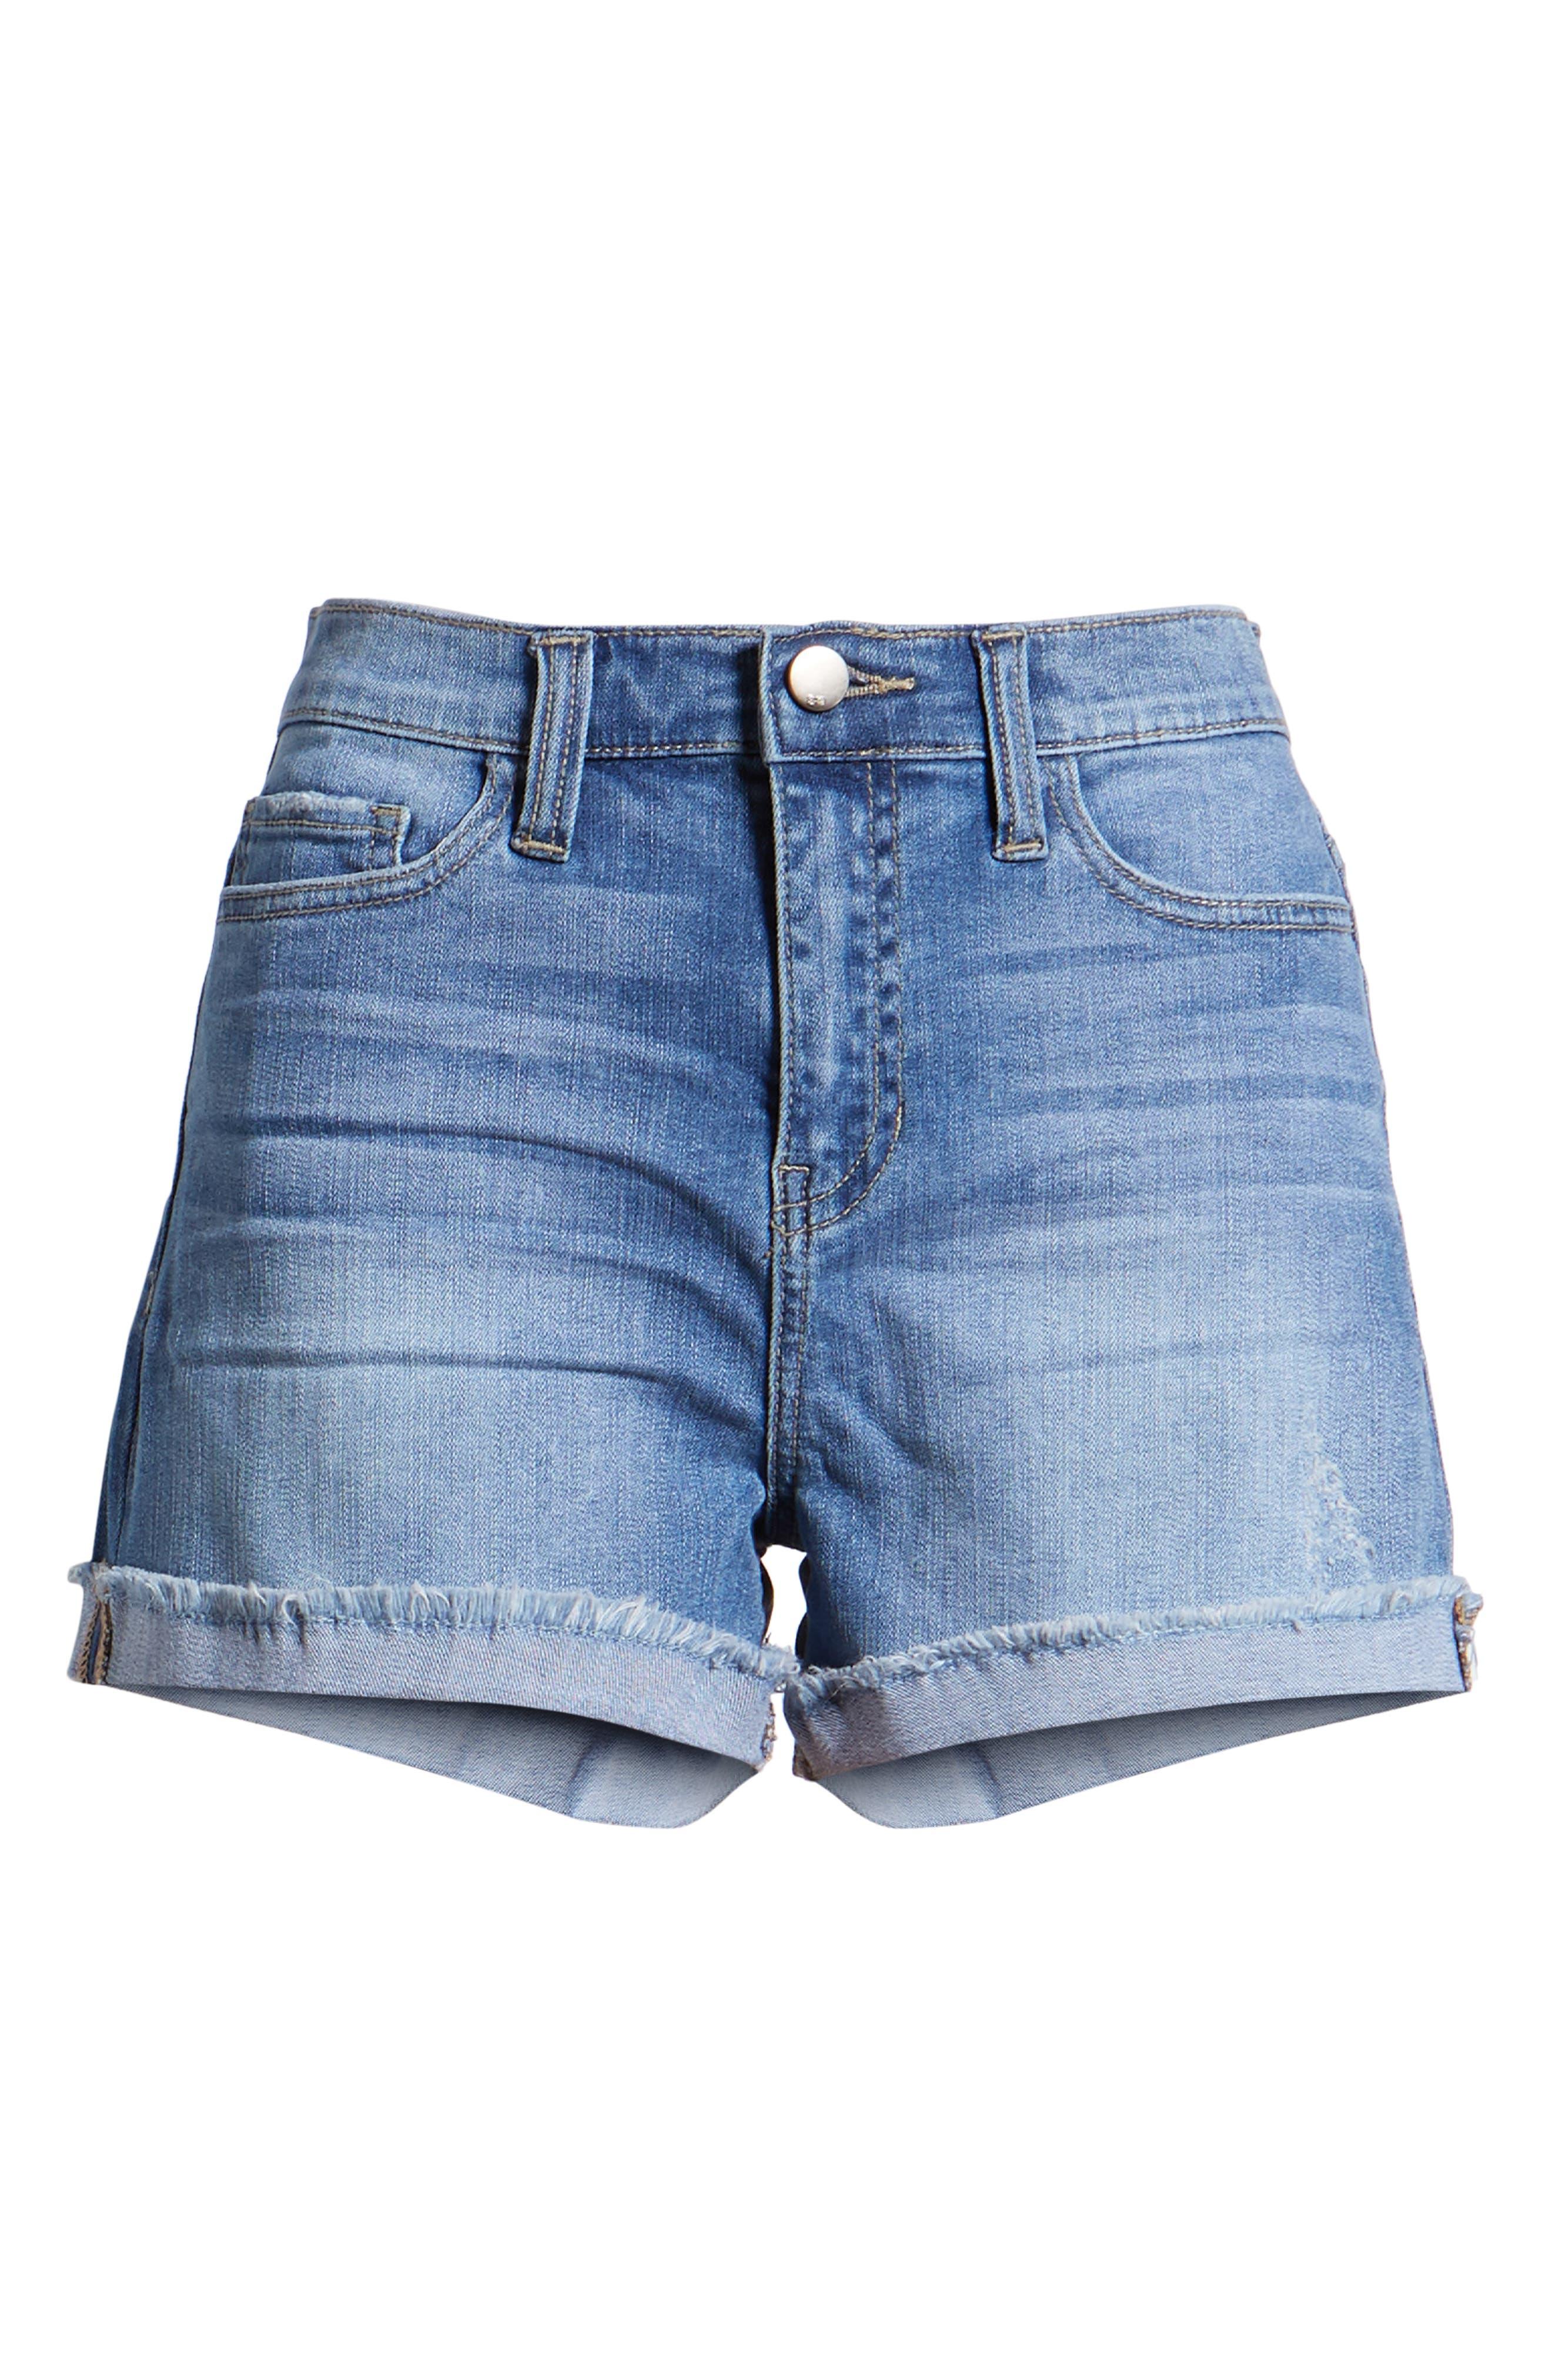 Cuffed Boyfriend Denim Shorts,                             Alternate thumbnail 7, color,                             Med Wash